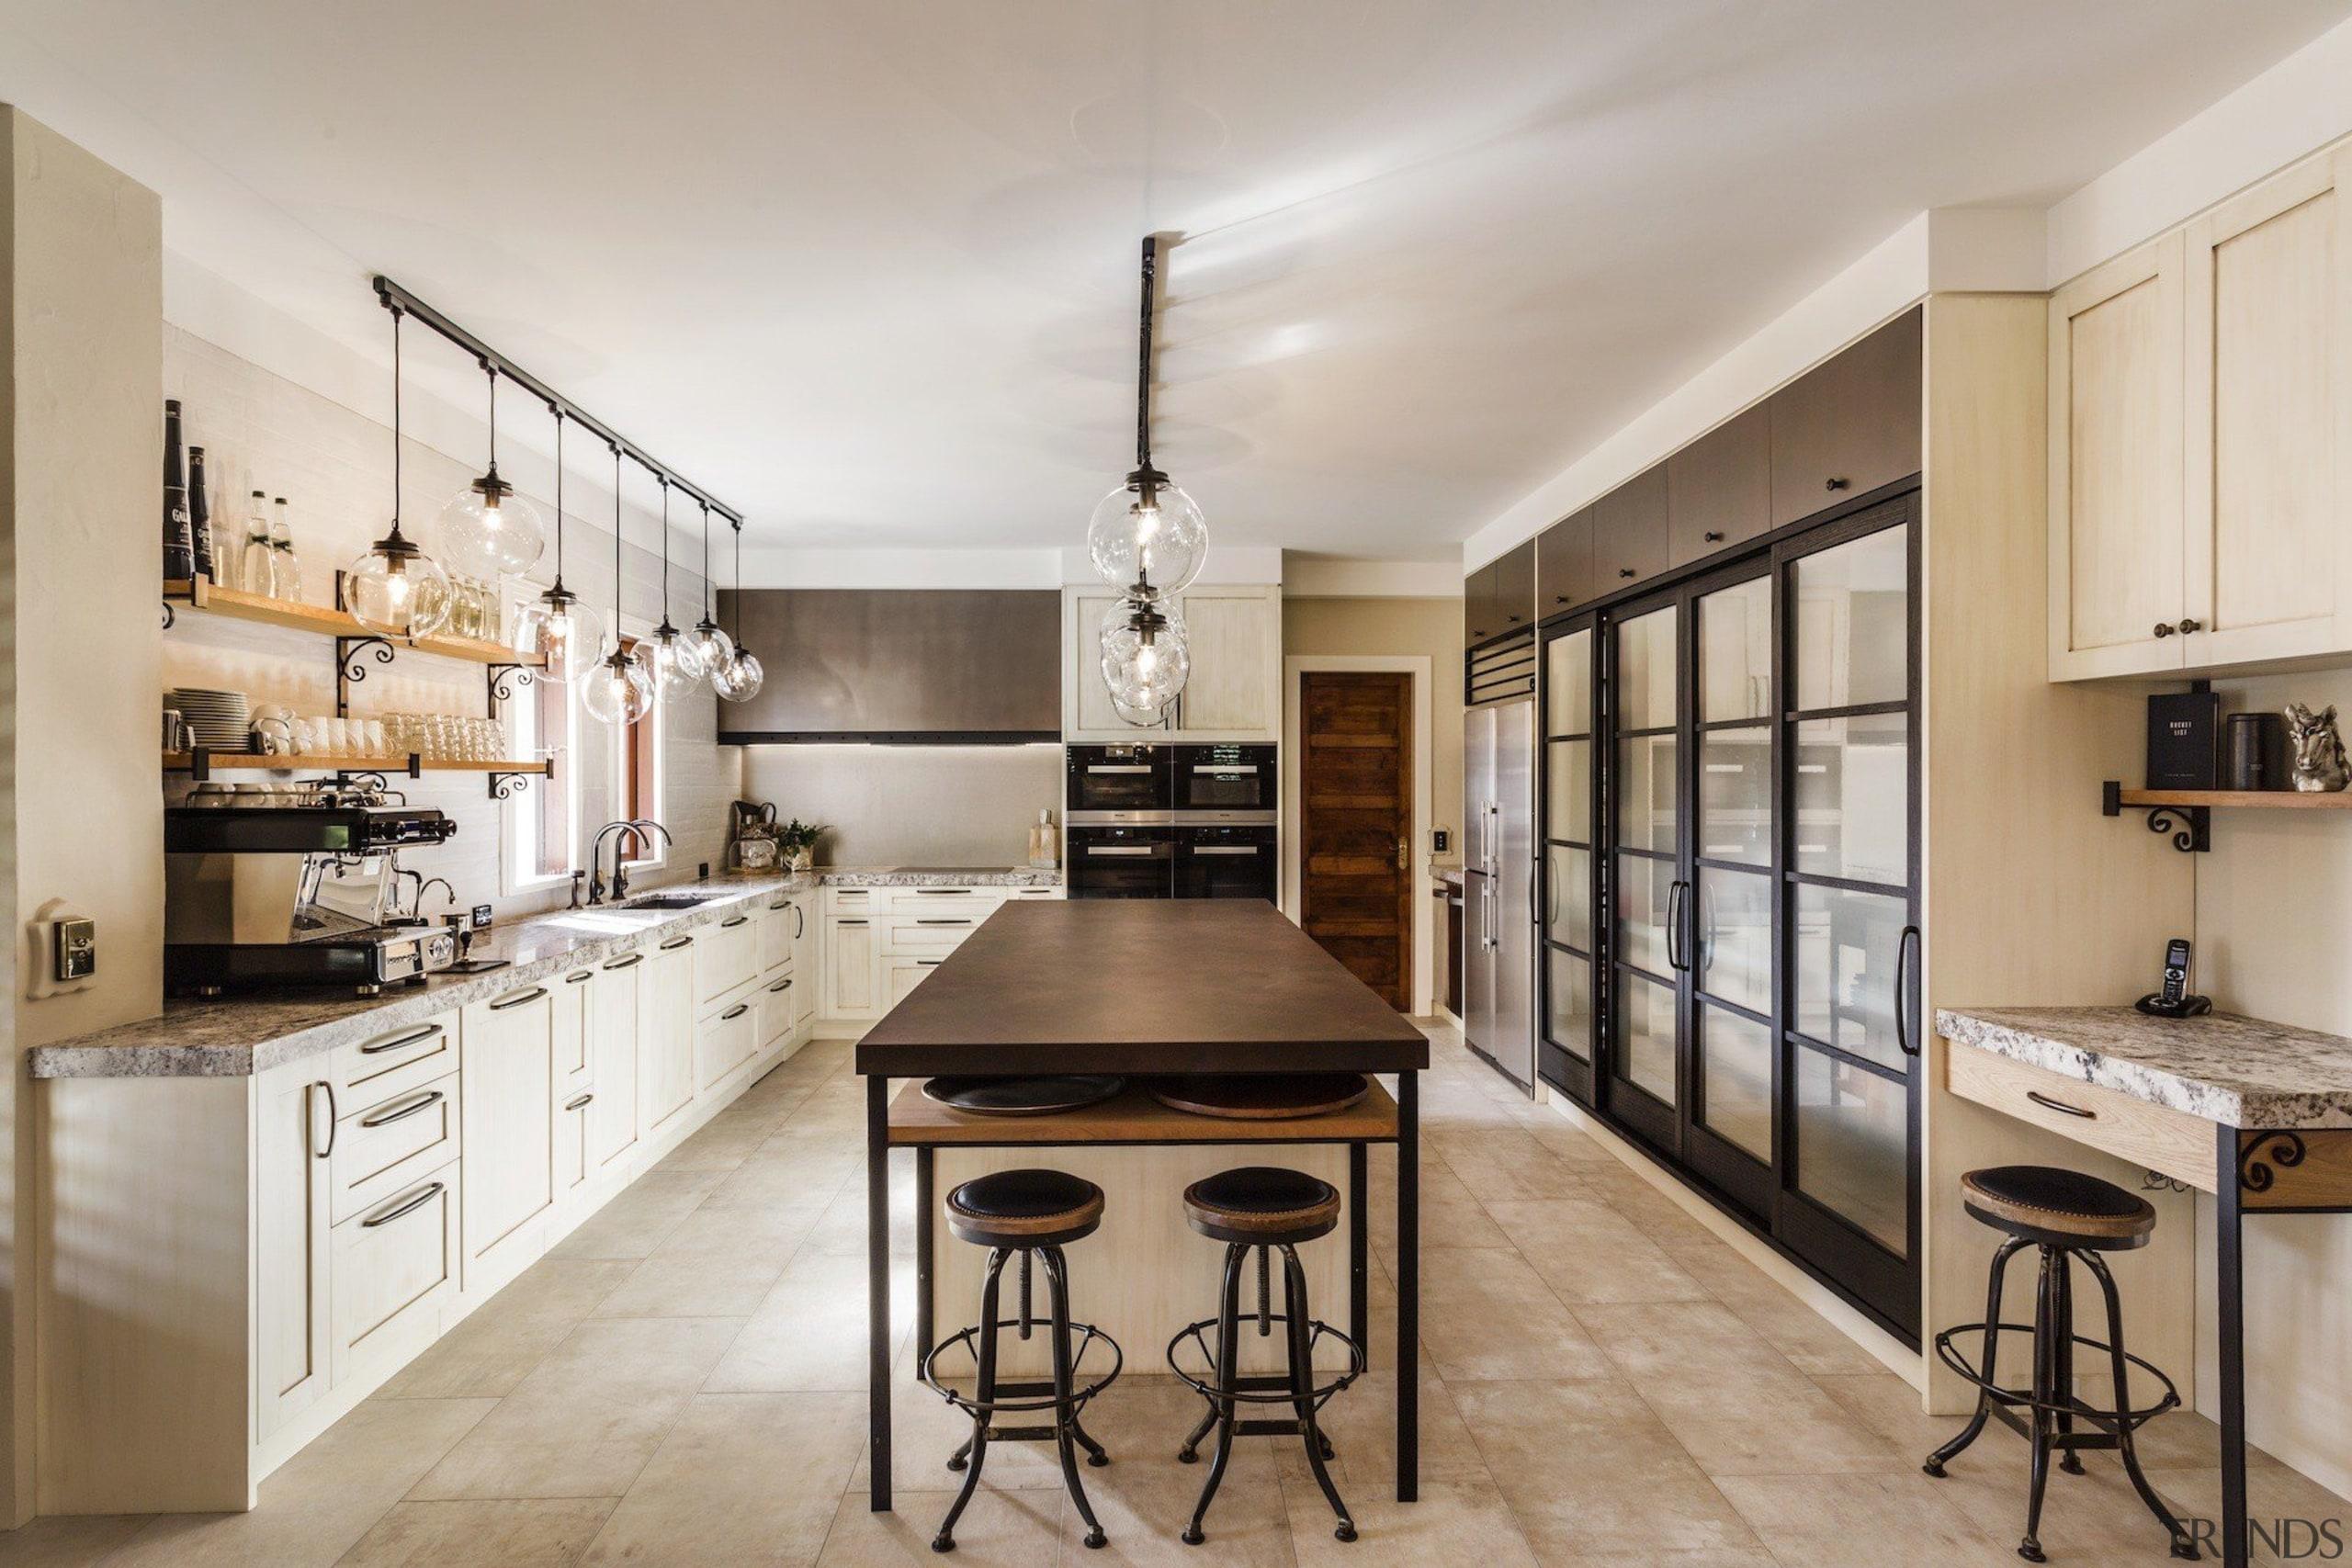 Kitchens By Design – TIDA New Zealand cabinetry, countertop, cuisine classique, interior design, kitchen, real estate, gray